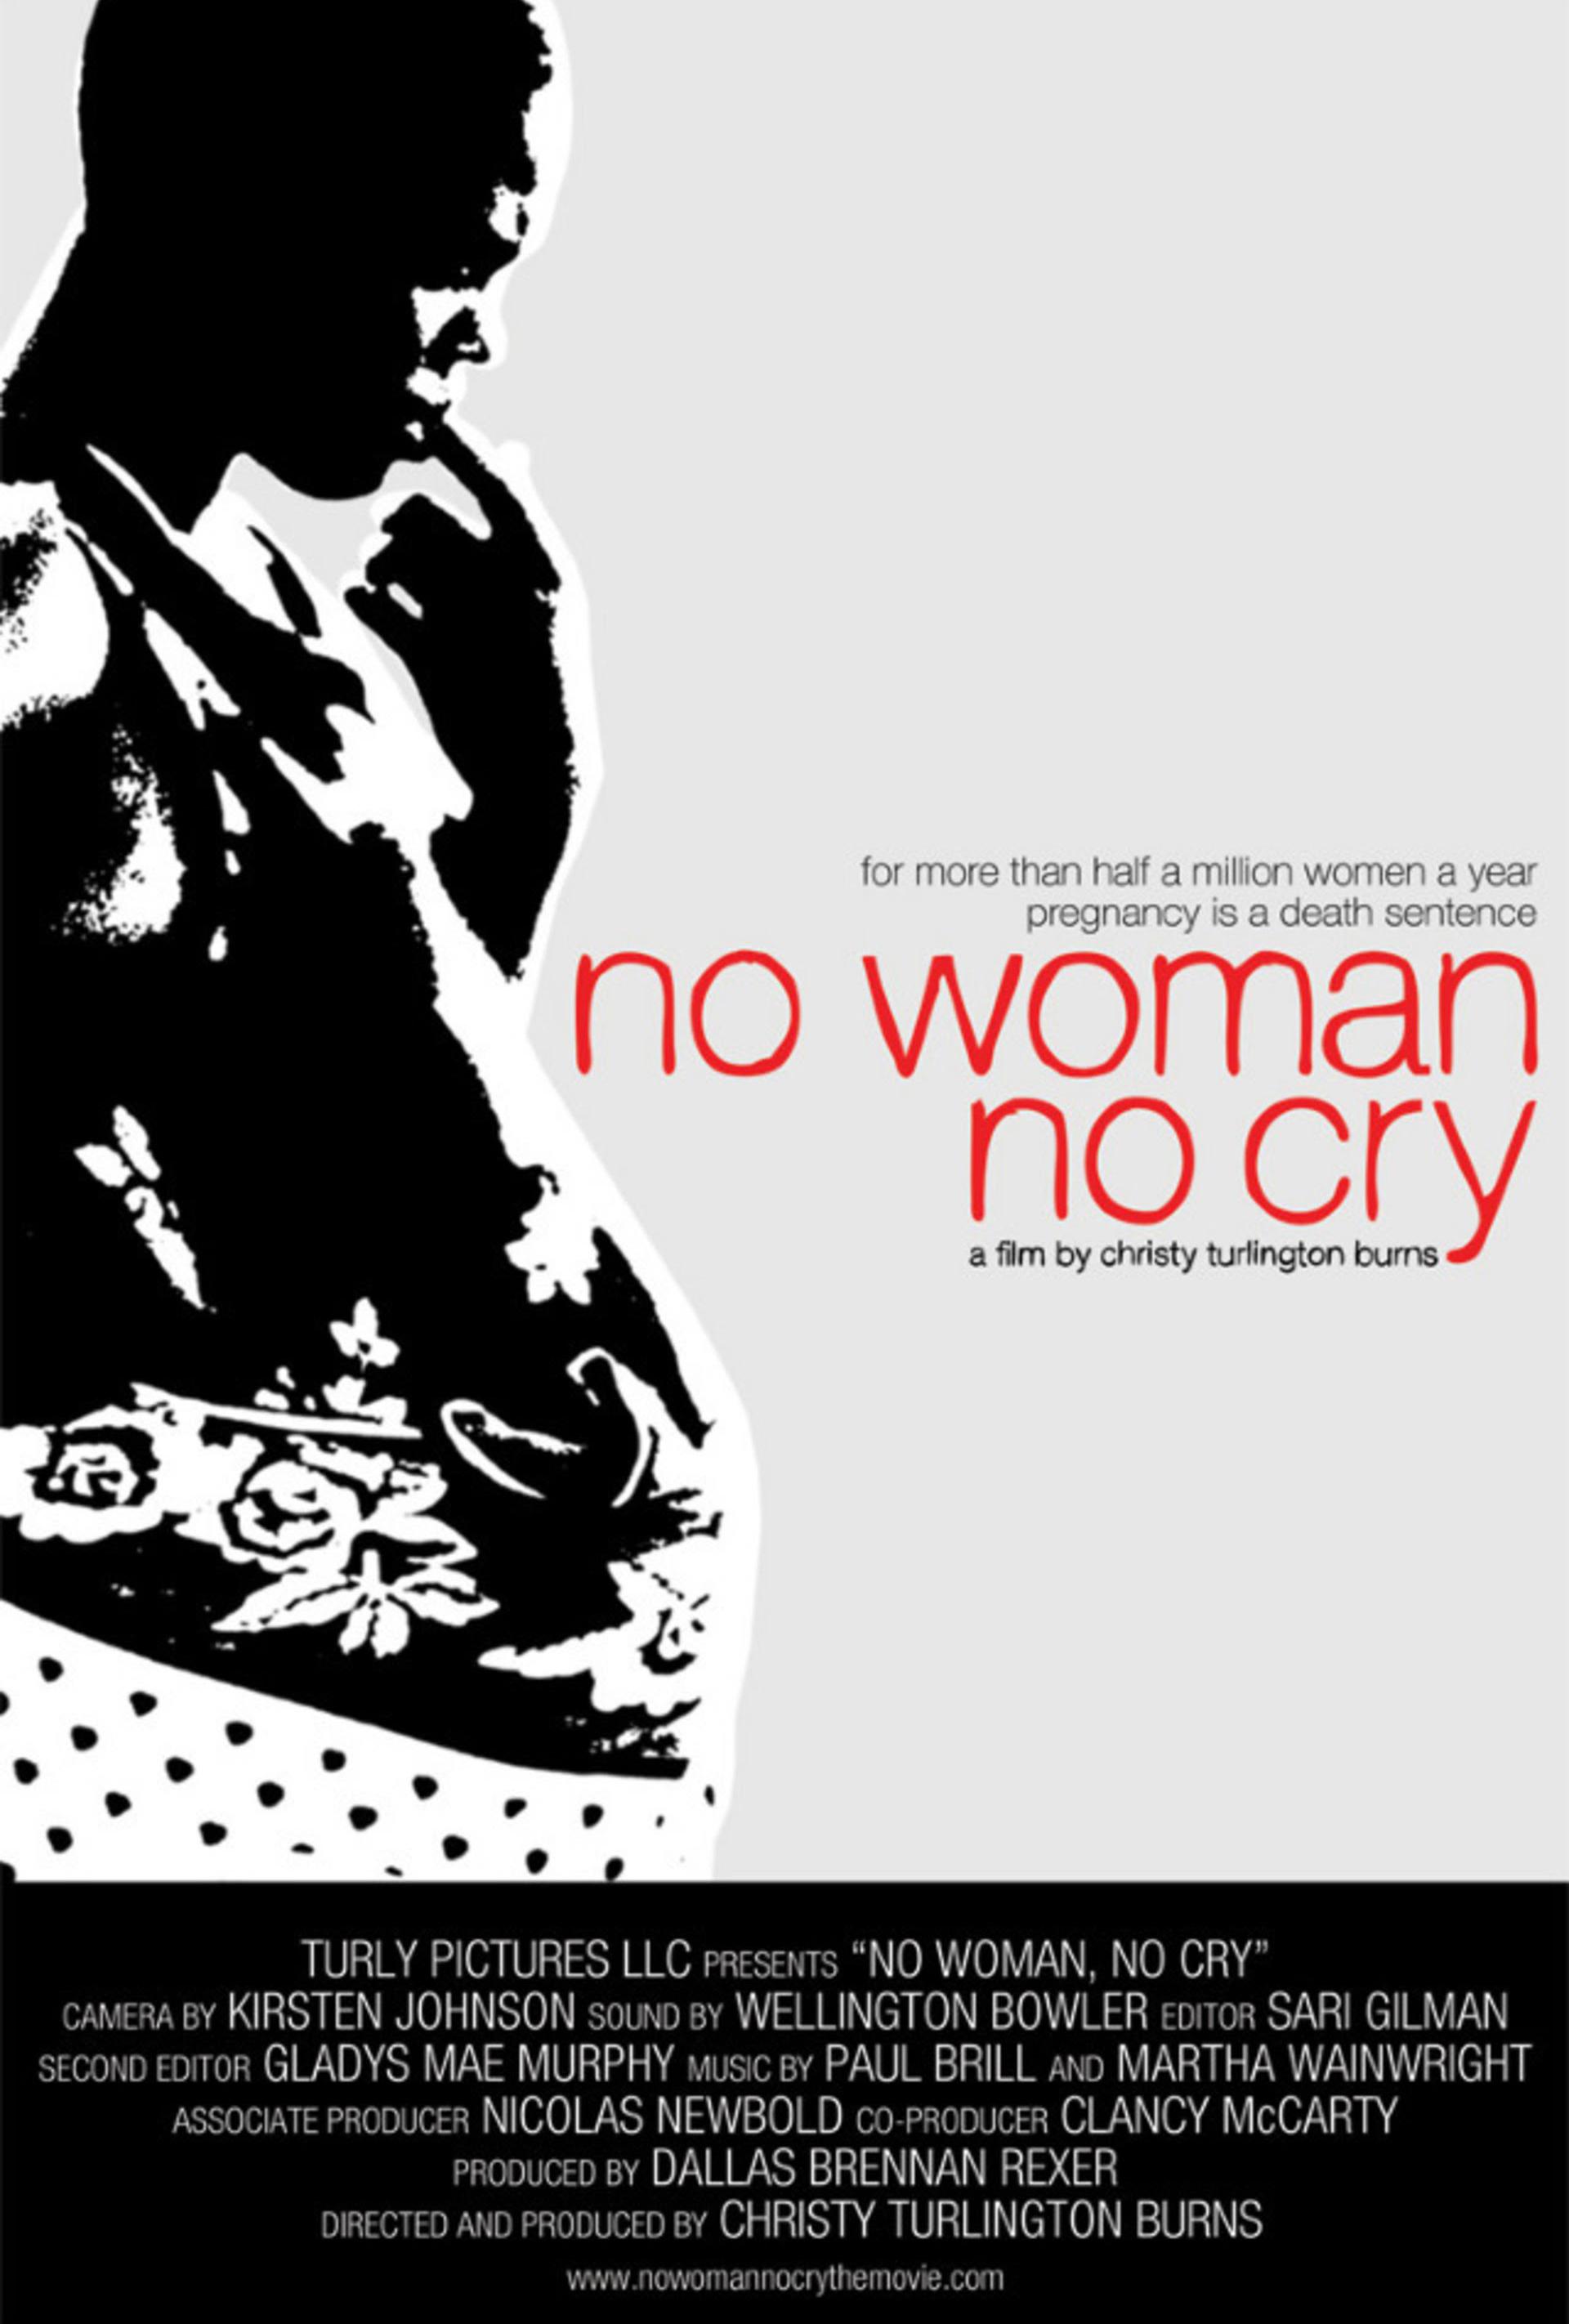 NO WOMAN, NO CRY  (2010)  EDITOR  TRIBECA FILM FESTIVAL  OWN NETWORK